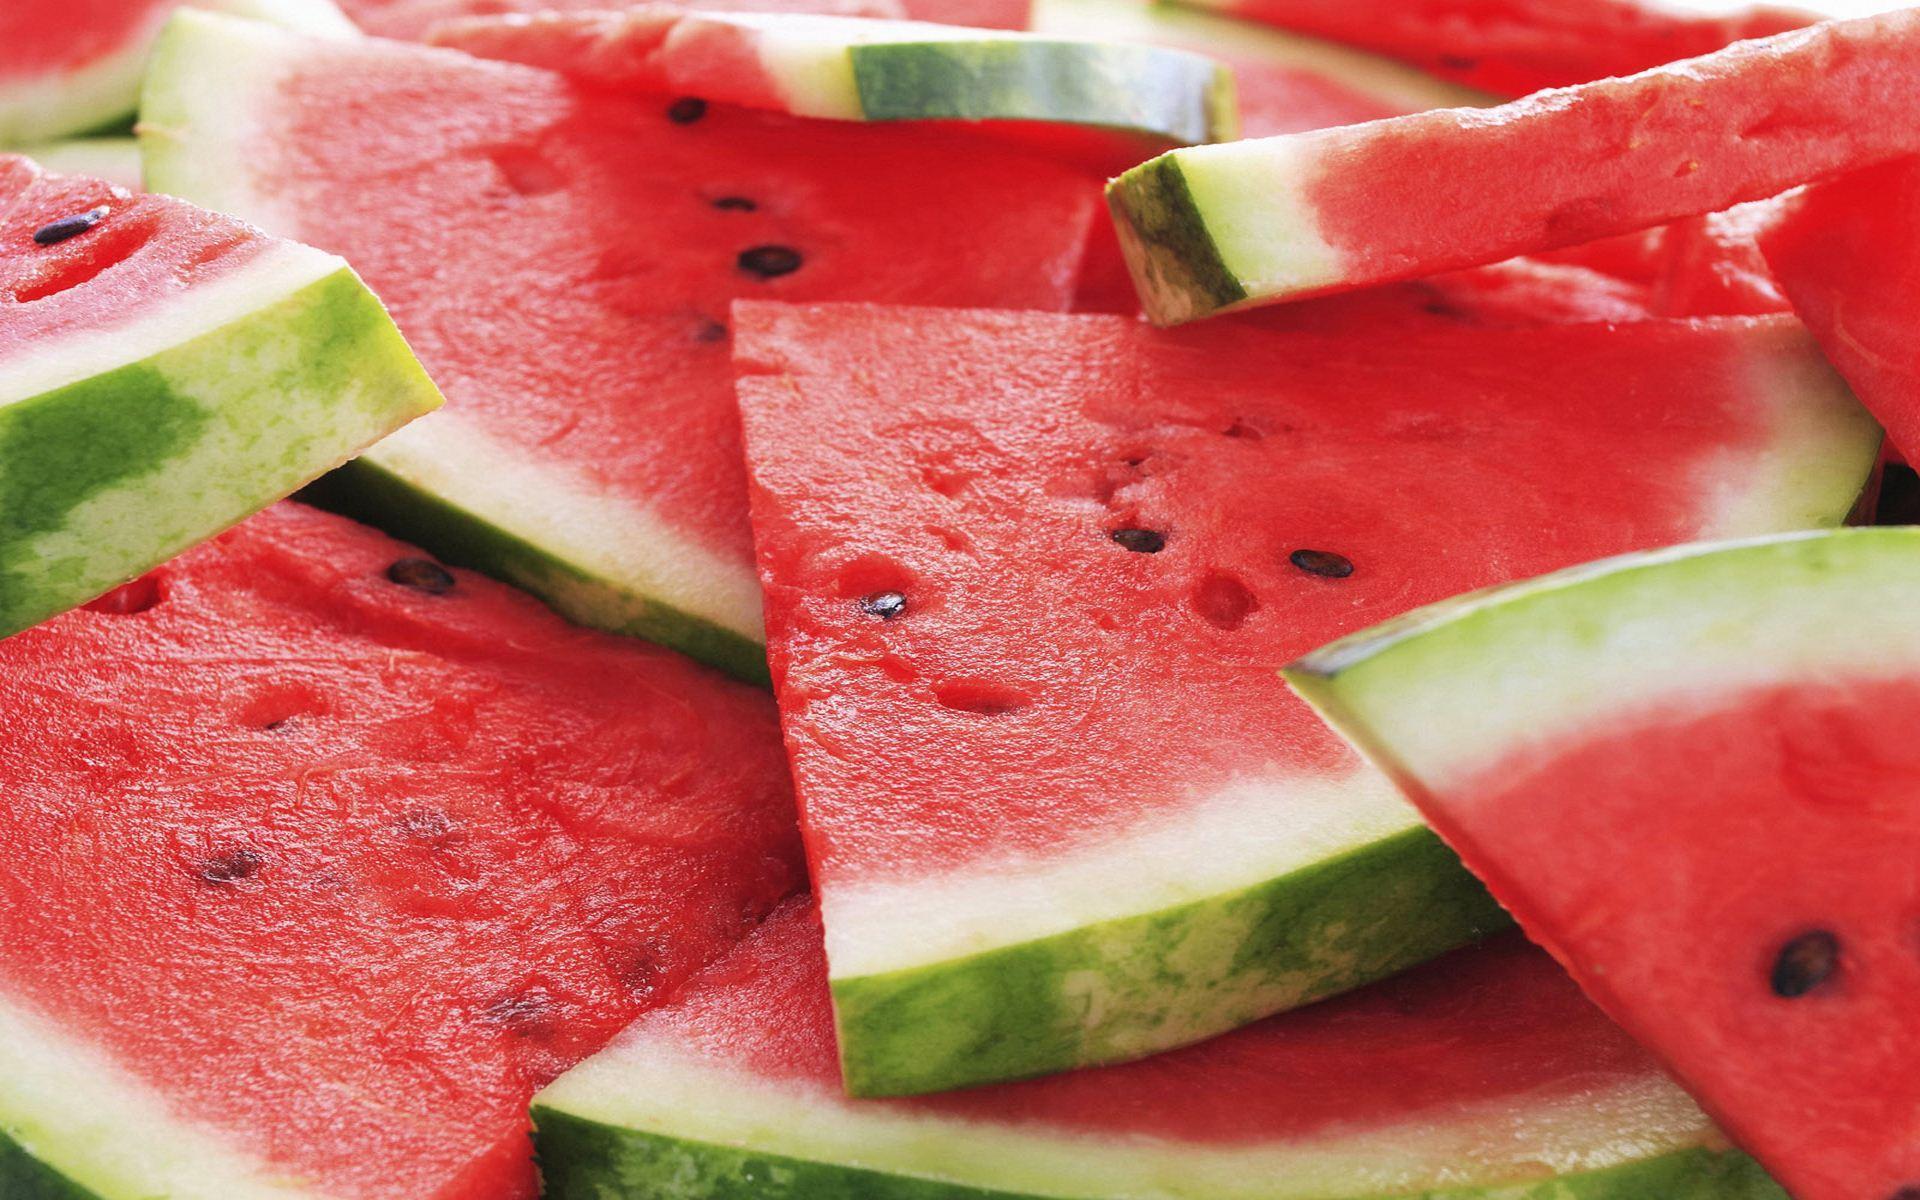 pics of water melon